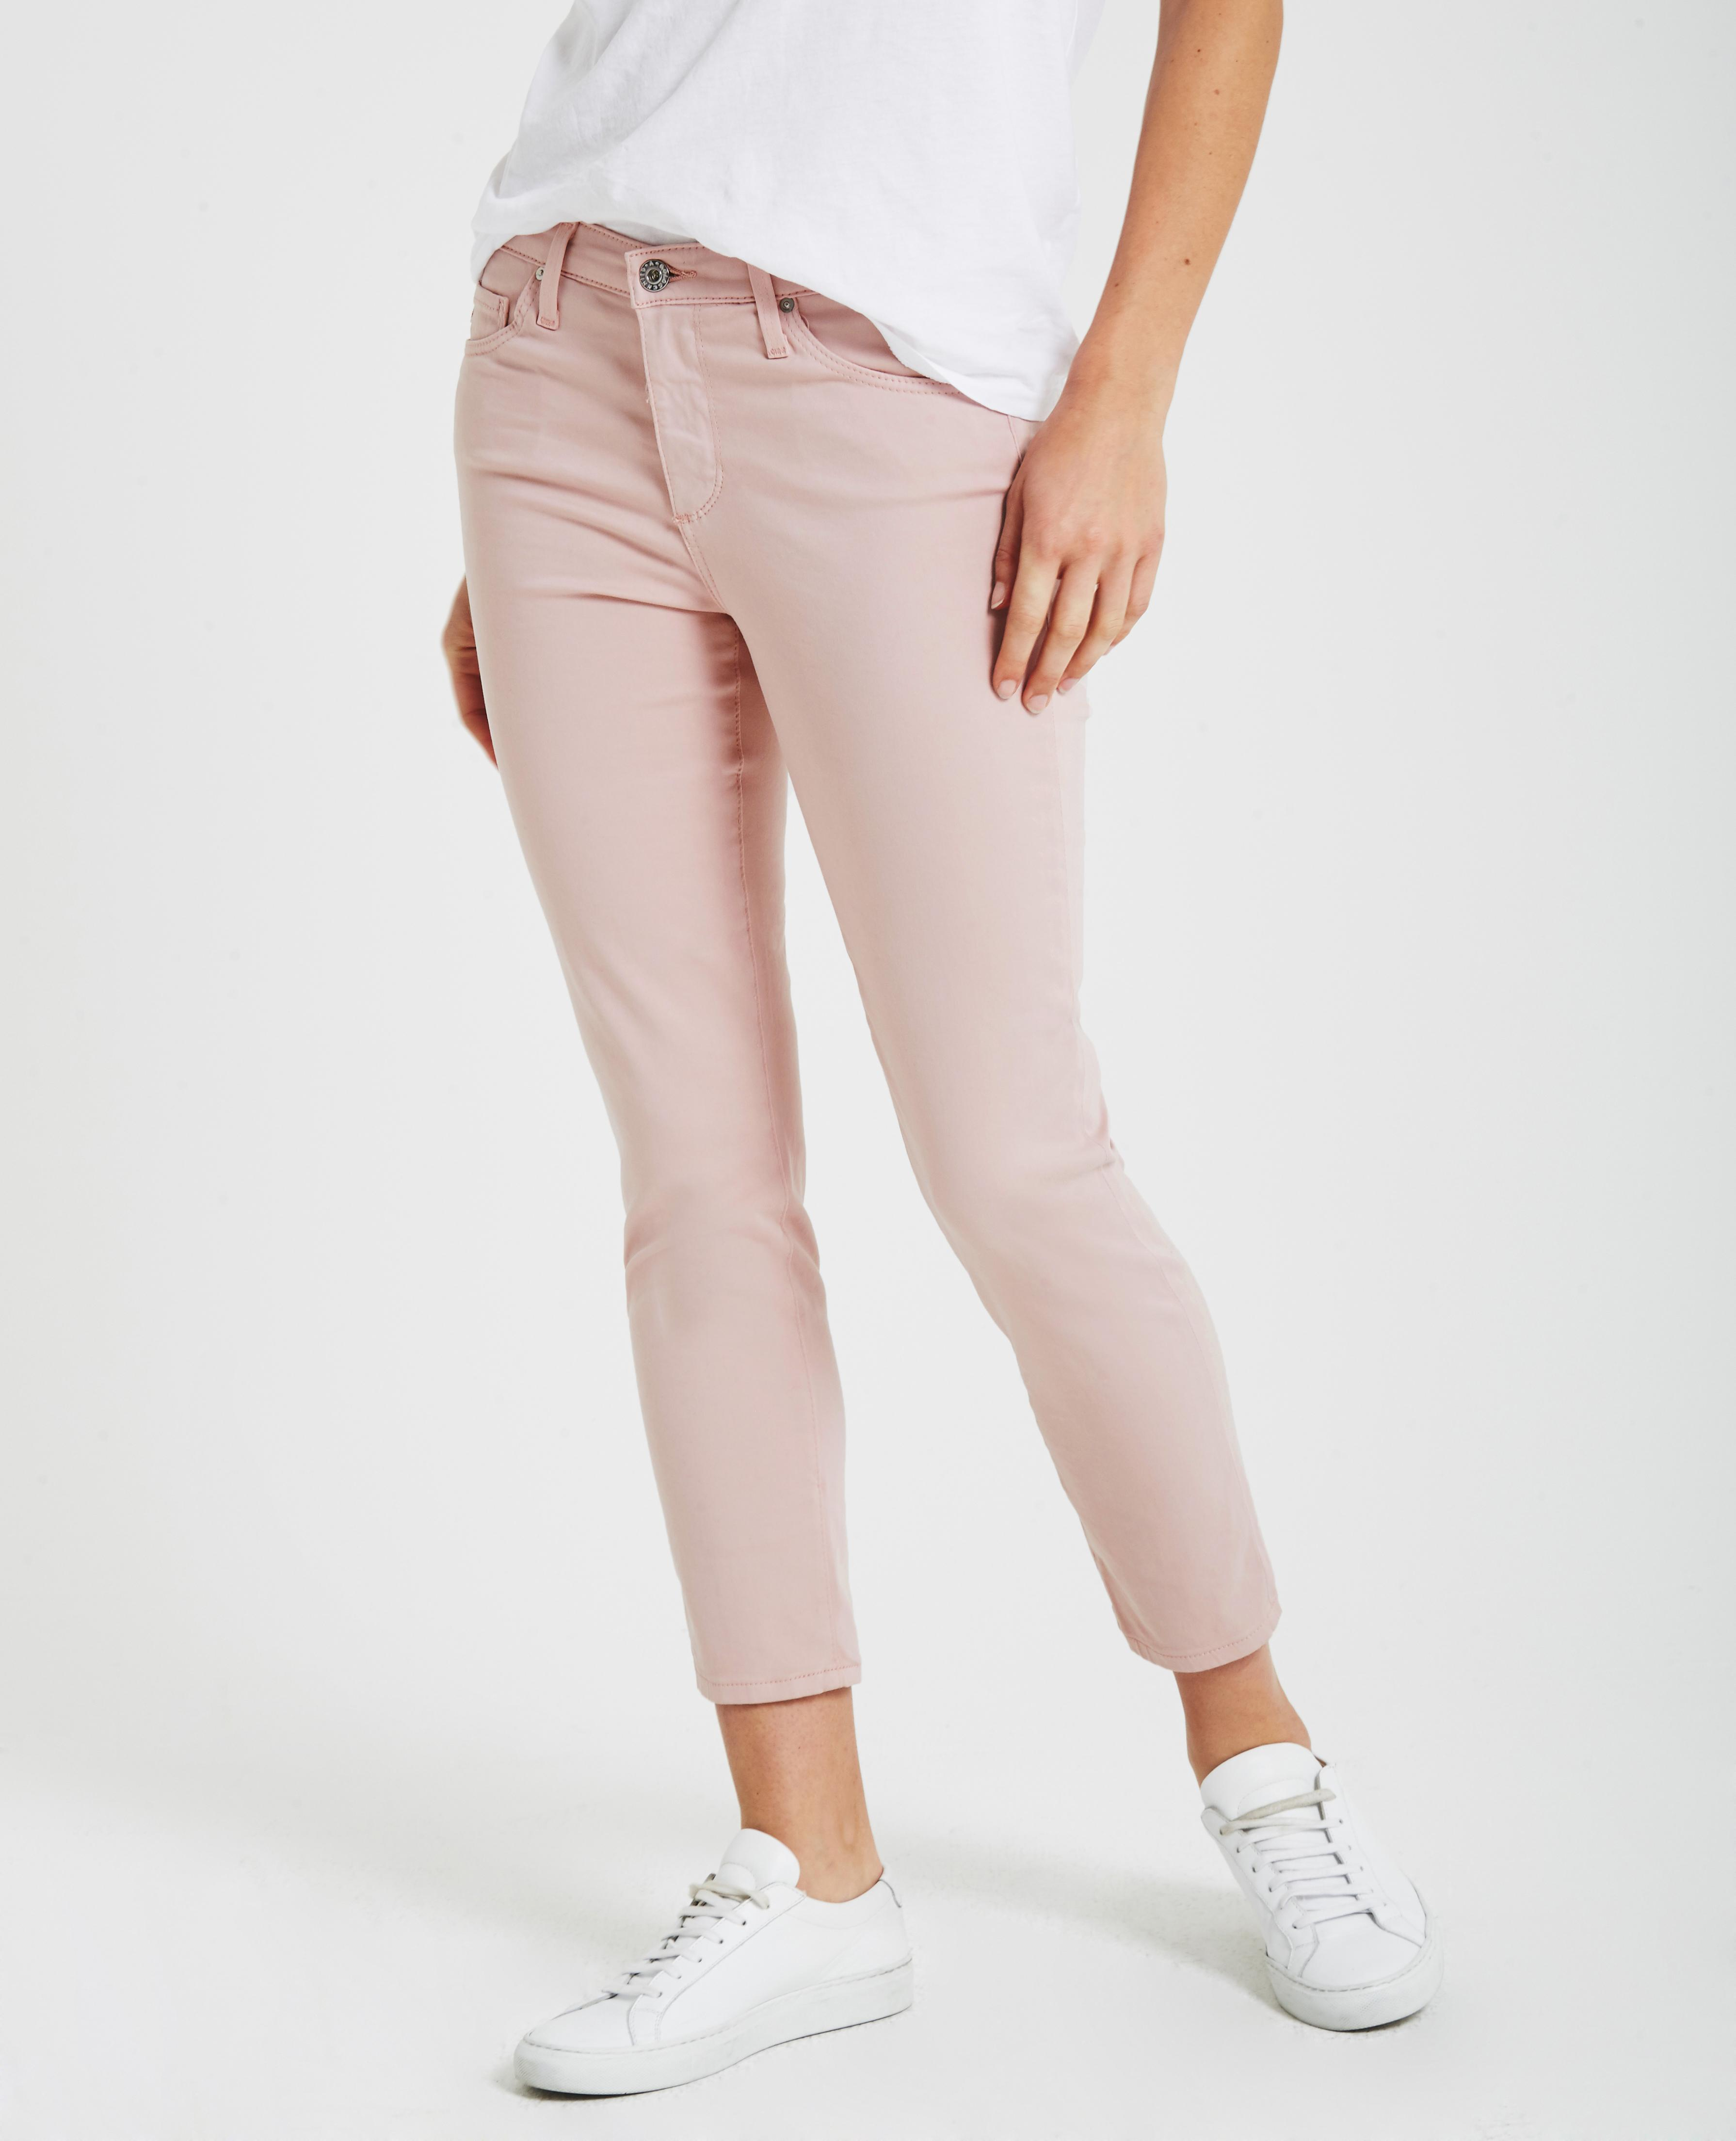 0c7779fce3e The Prima Crop in Rose Quartz AG Jeans Official Store